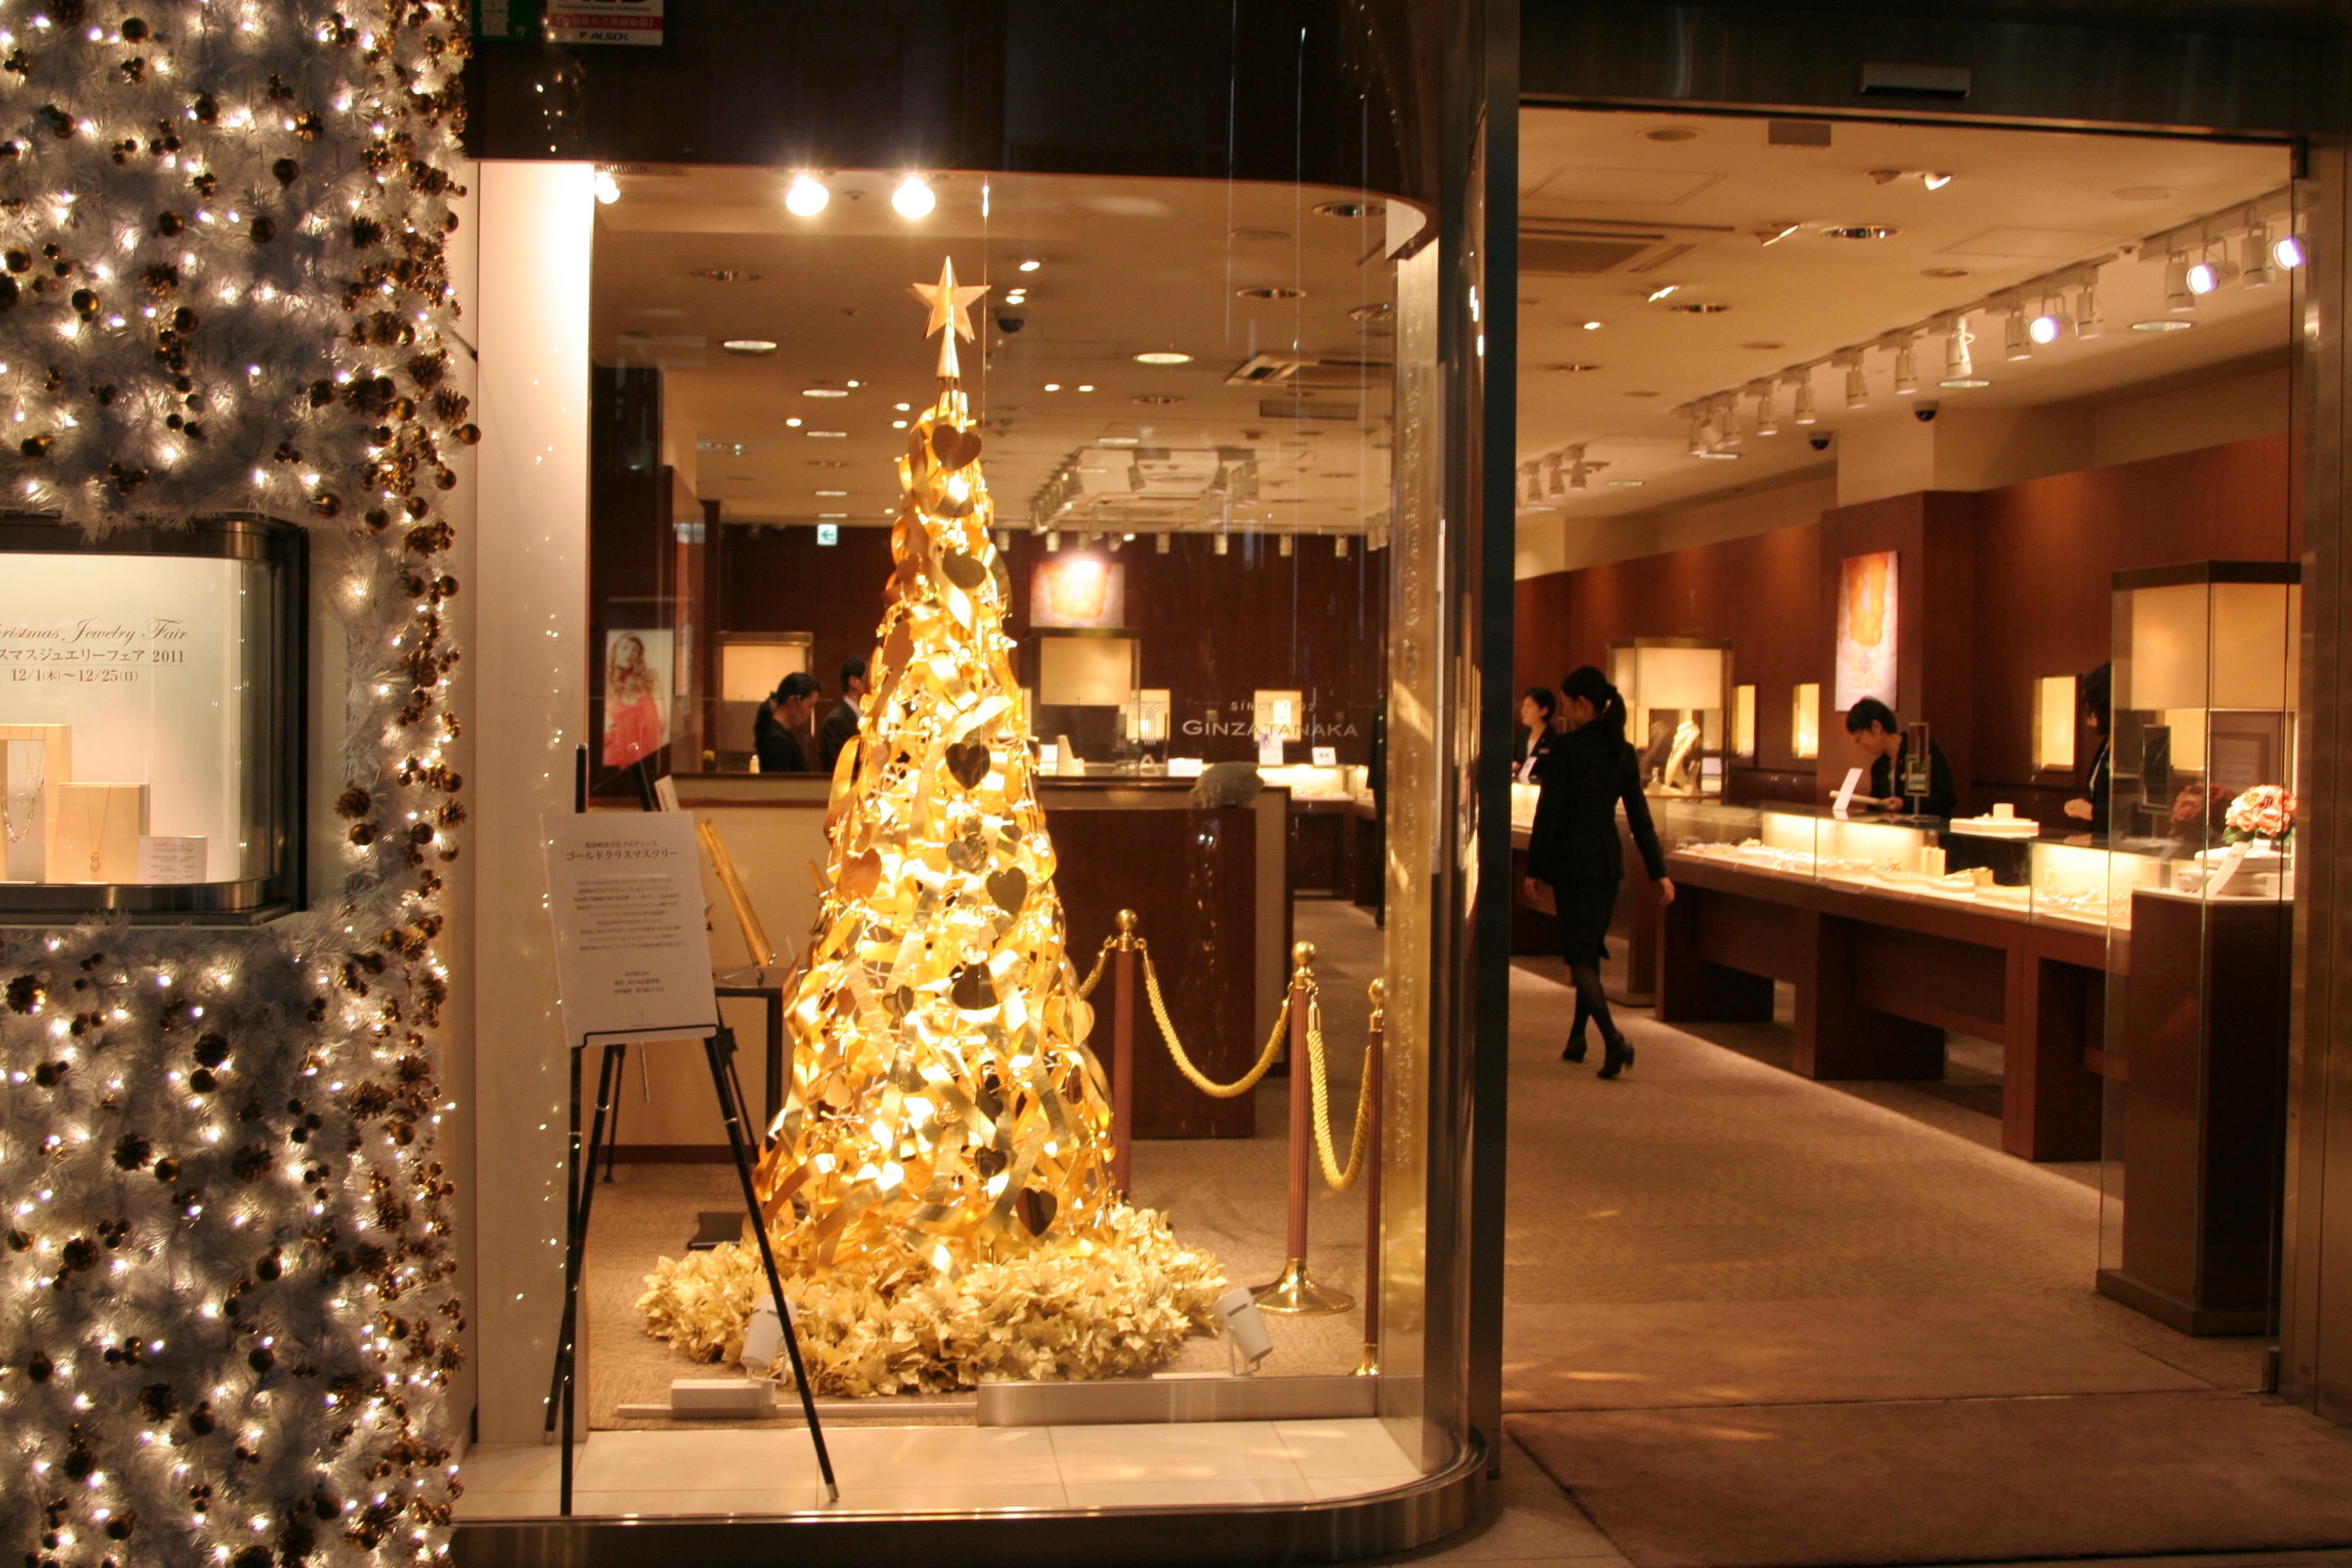 filegolden christmas tree in ginza tokyojpg - Golden Christmas 2